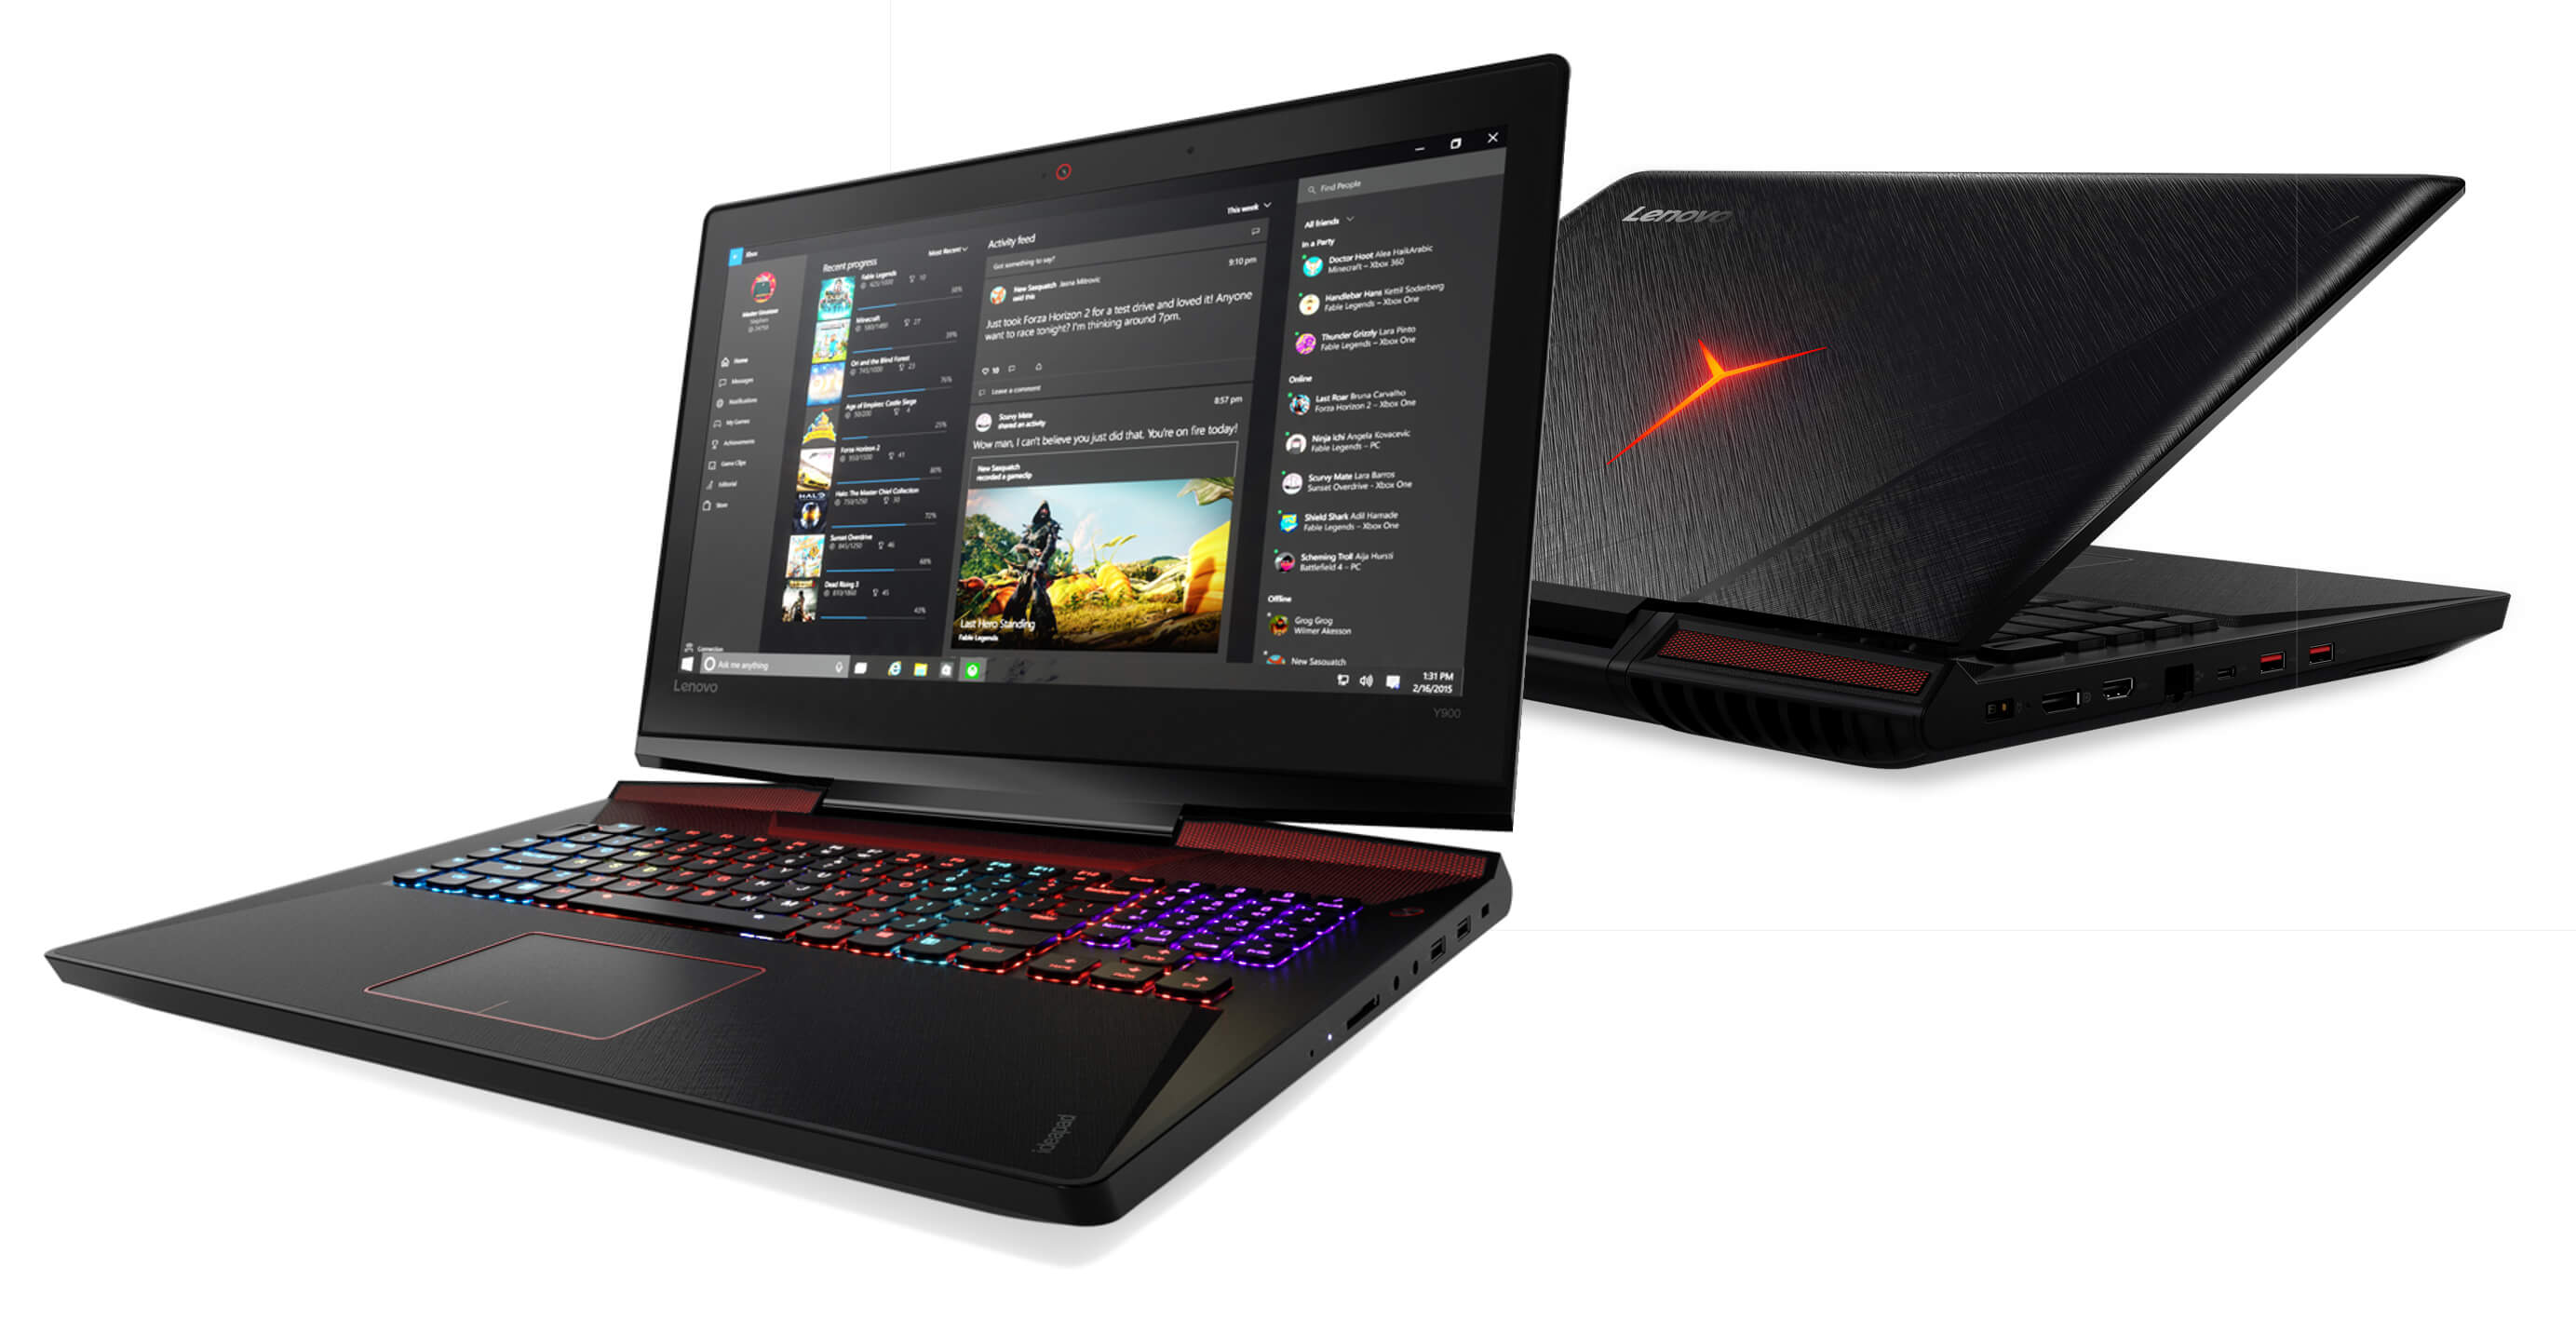 Photo of Lenovo Ideapad Y900 Tawarkan Pengalaman Gaming Yang Mengesankan